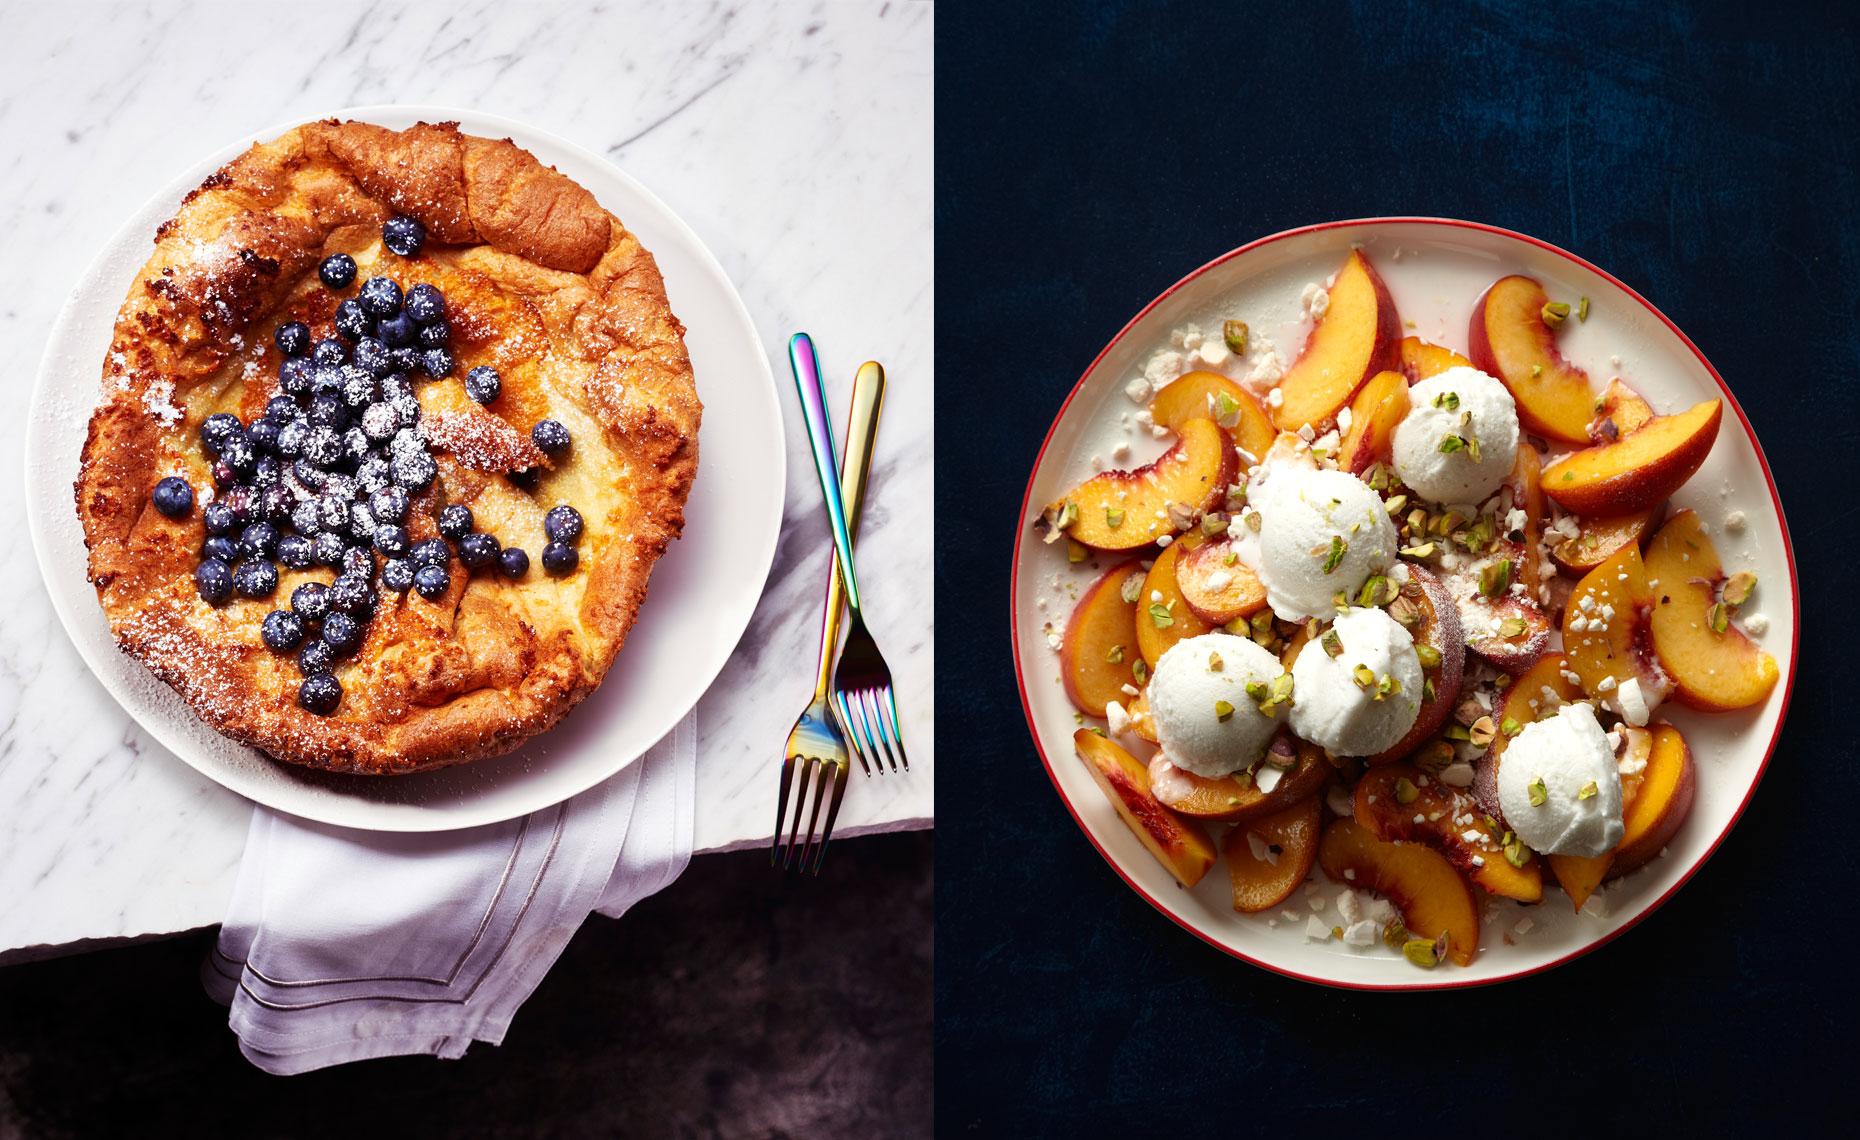 blueberry-pancake-and-ice-cream-peaches.jpg